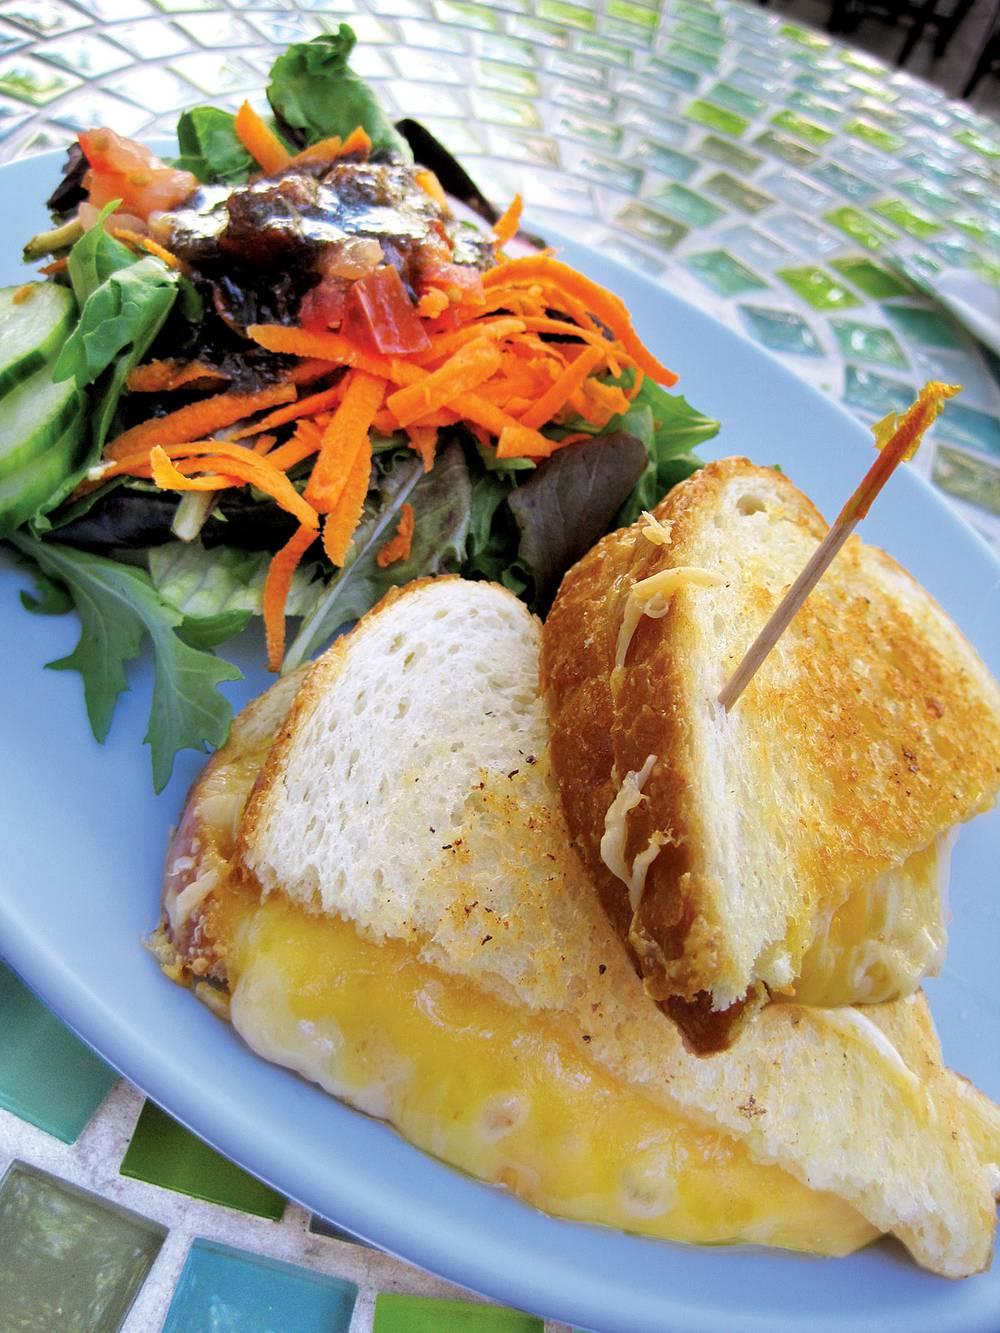 gruyere parmesan and cheddar make the cheese sandwich at rachels kitchen a rich delight - Rachels Kitchen